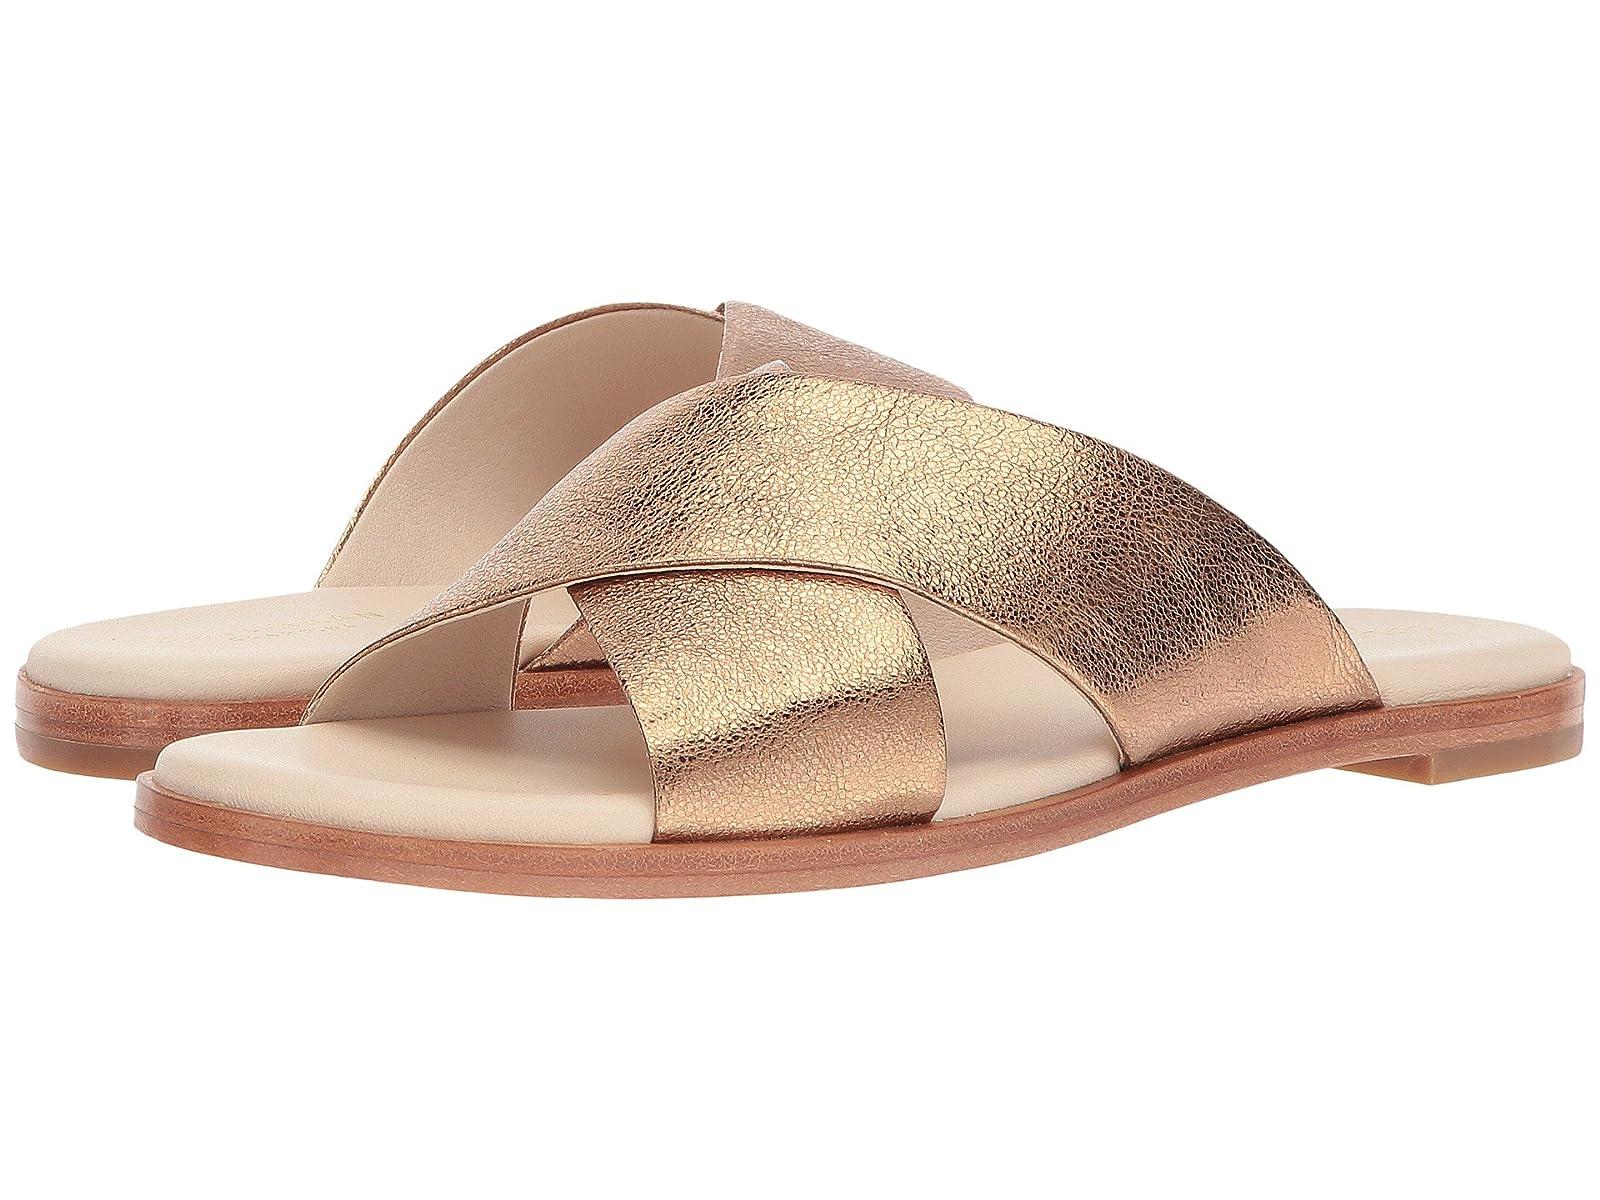 Cole Haan Anica Crisscross SandalCheap and distinctive eye-catching shoes